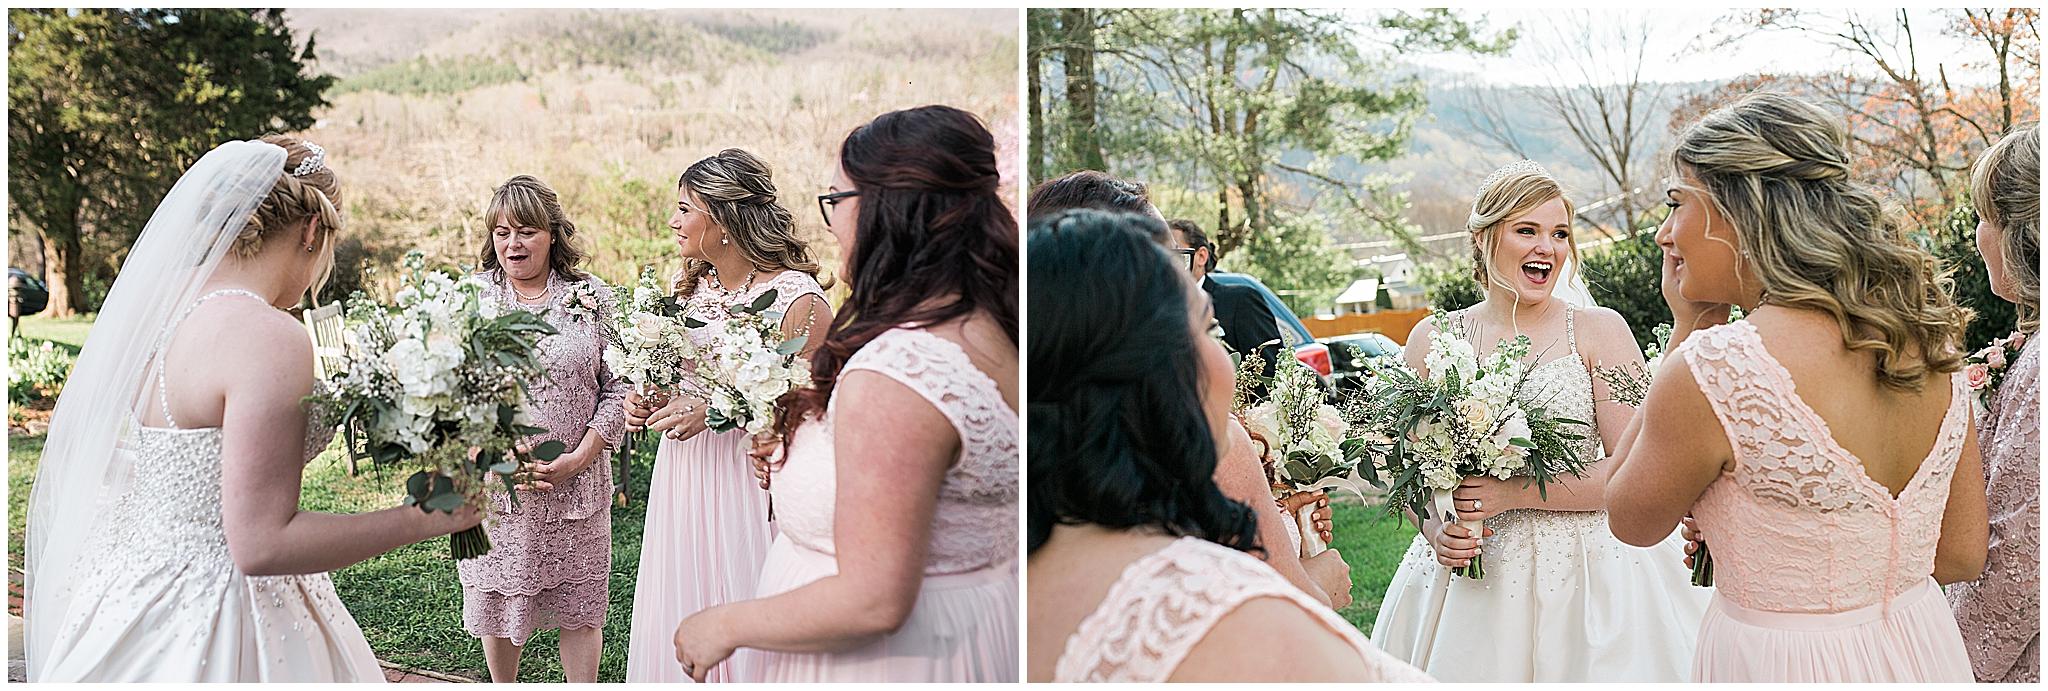 Wedding_Photographers_Asheville_Mountain_Magnolia_Inn_0018.jpg